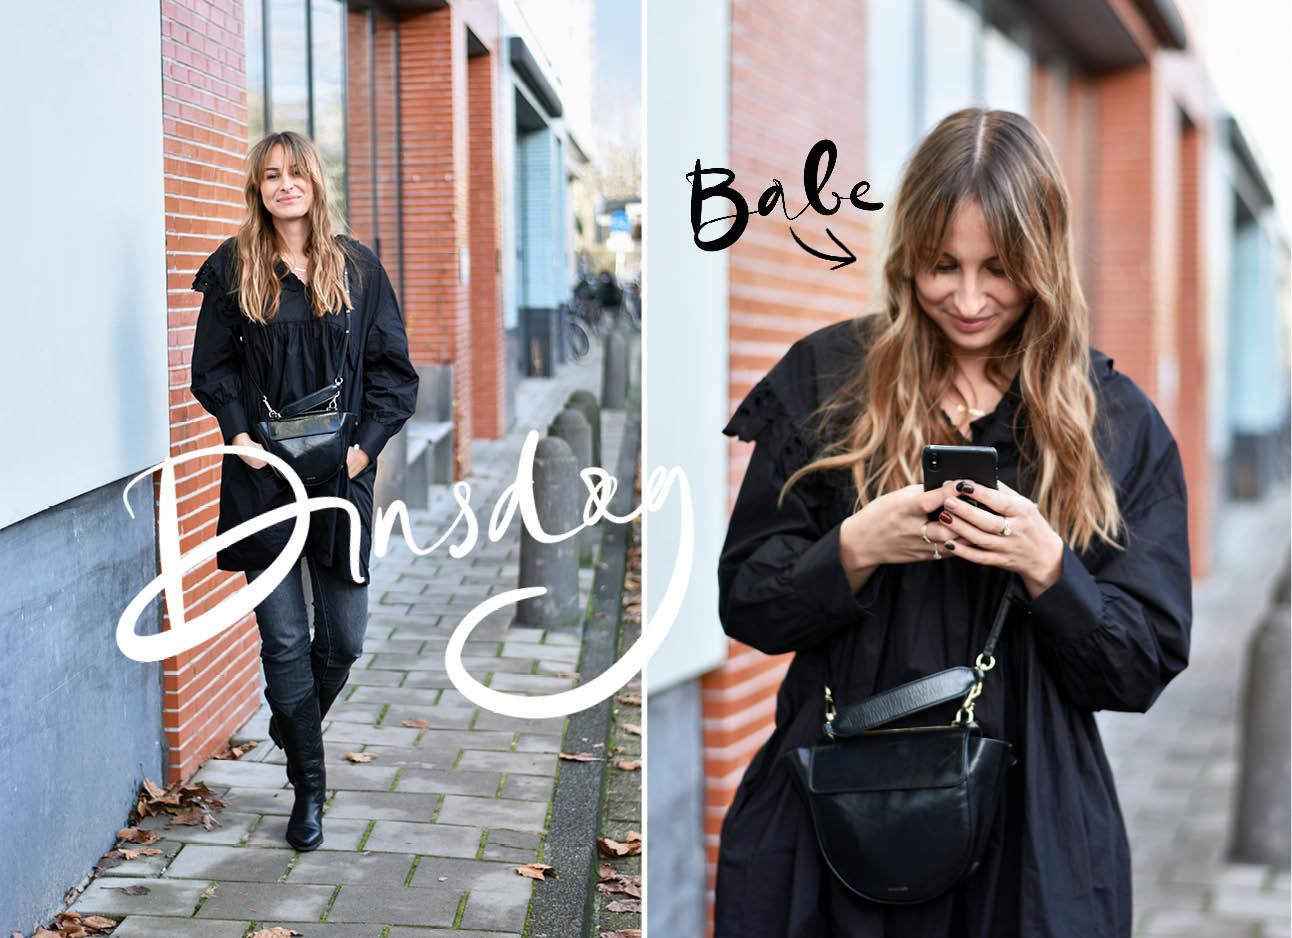 Lilian Brijl look of the day lachend met wandler tas boots en zwarte jurk aan